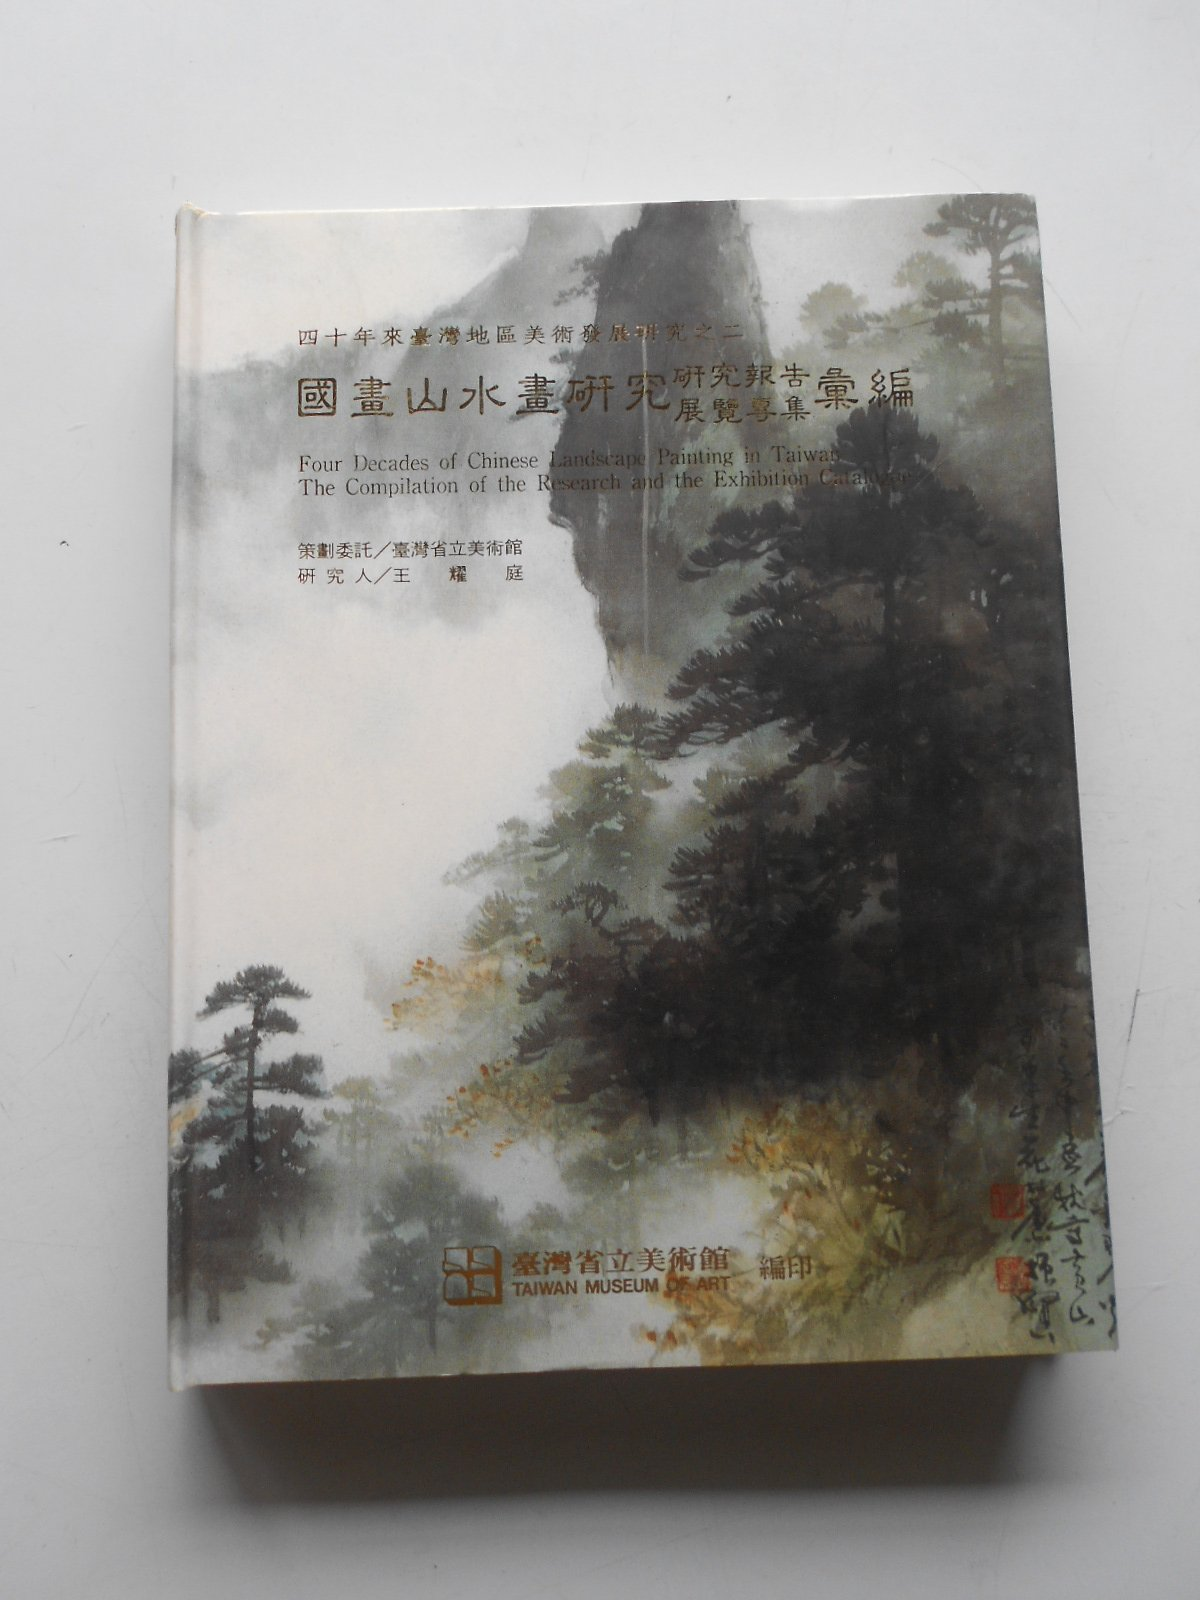 hs47554351 四十年來臺灣地區美術發展研究之二--國畫山水畫研究研究報告展覽專輯彙編**